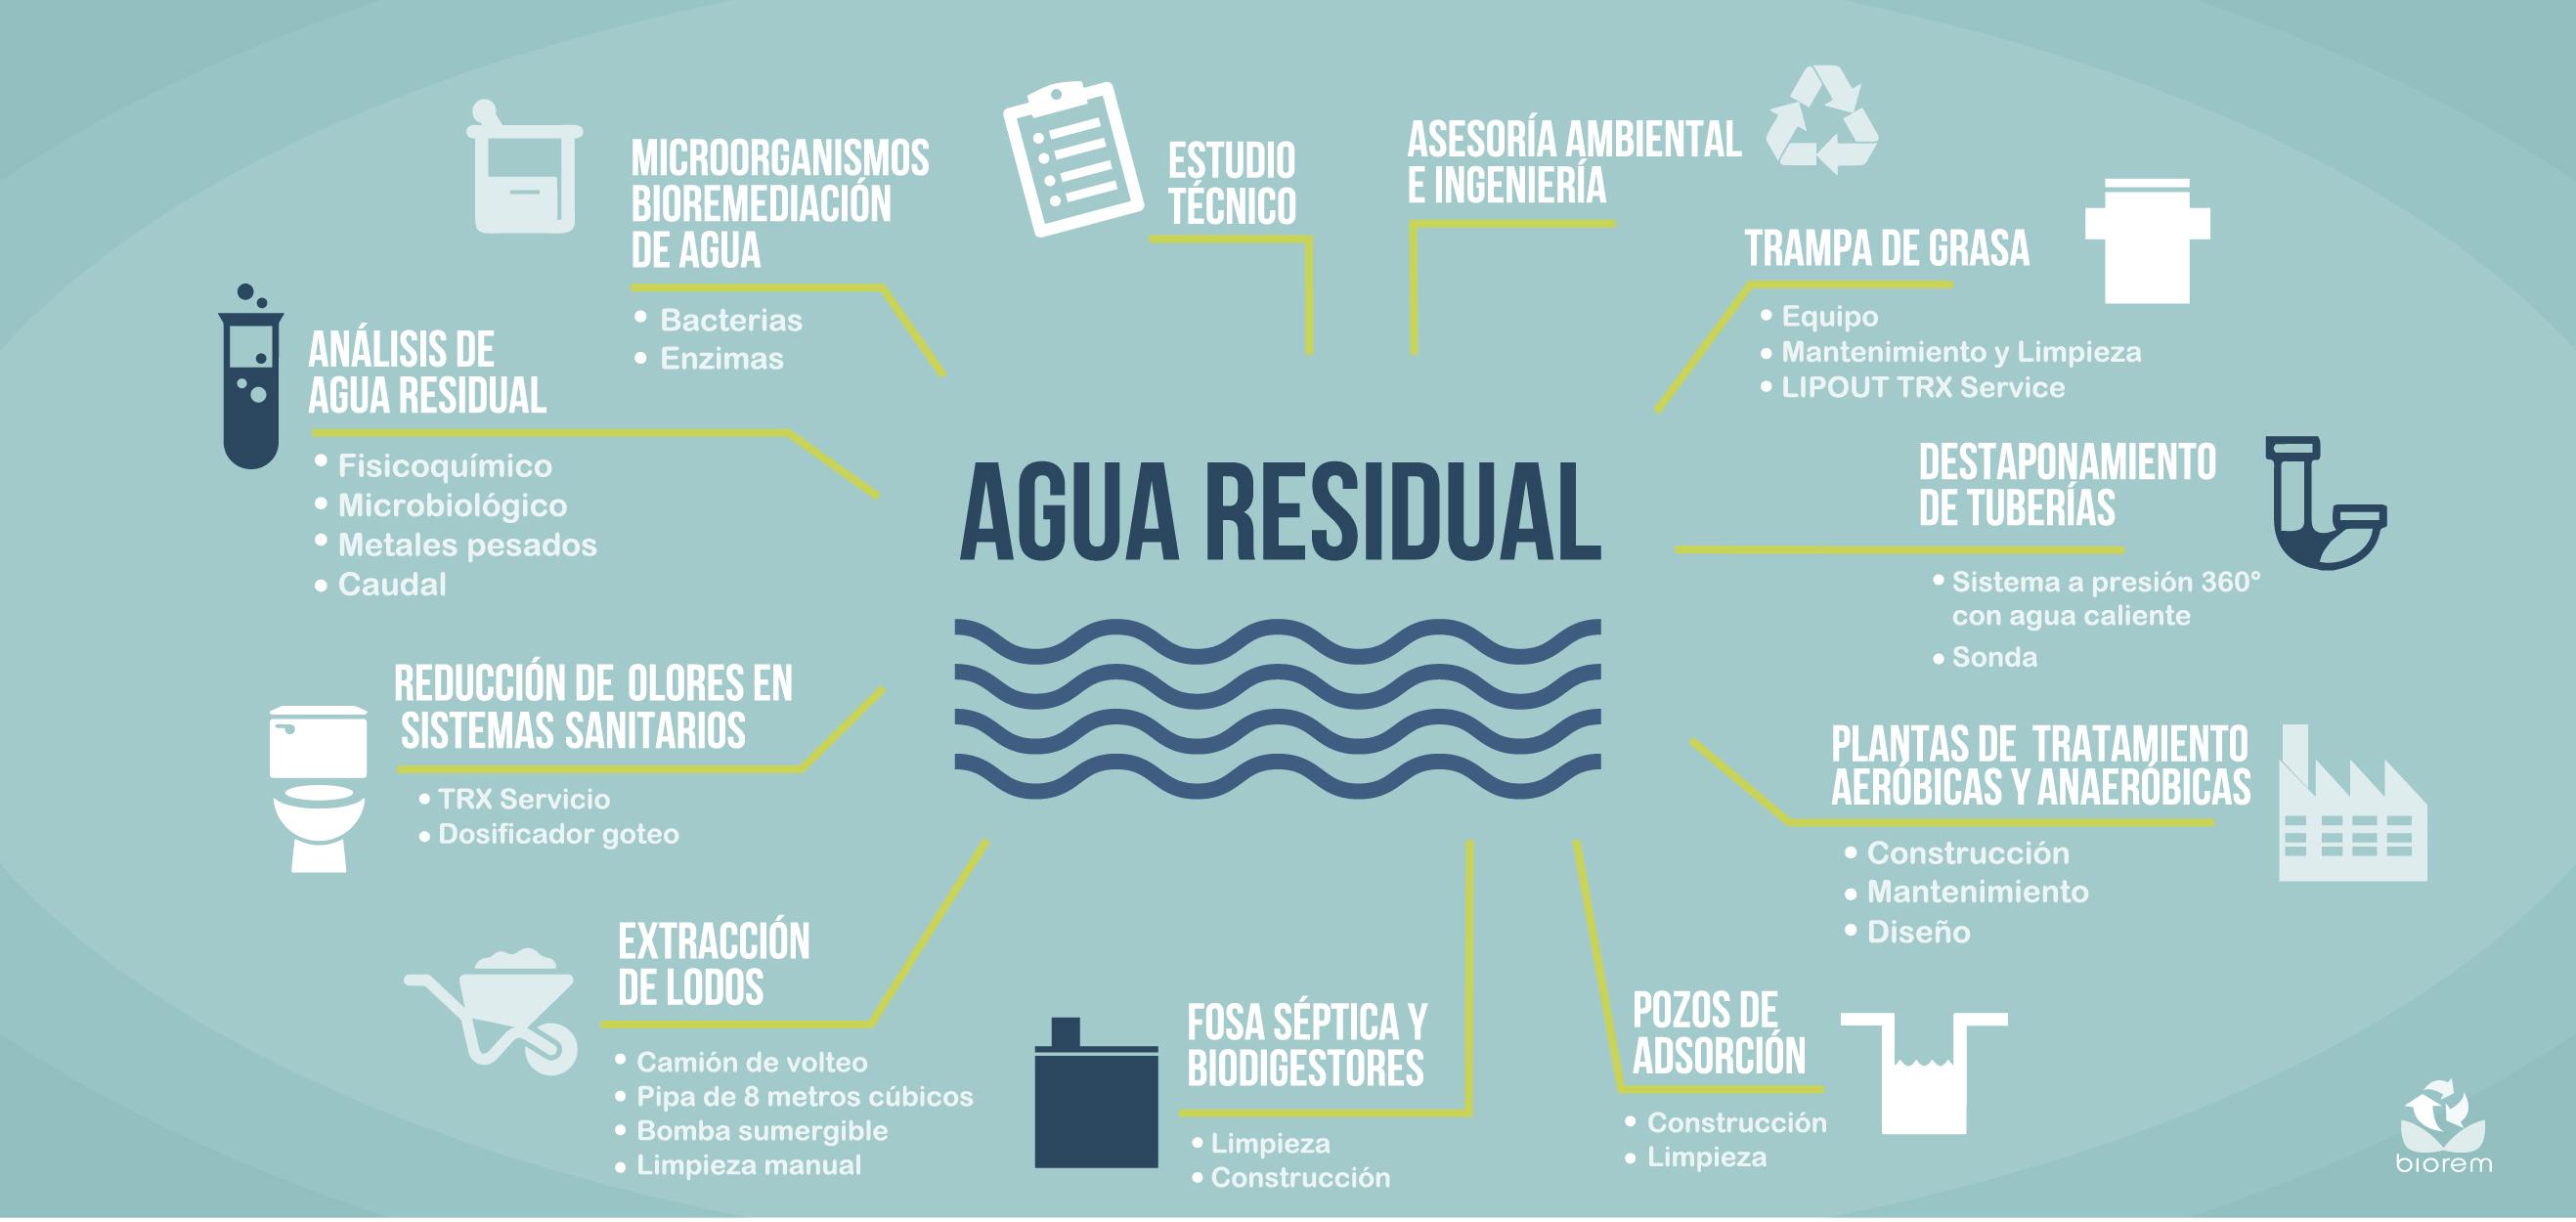 Agua Residual Bacterias Enzimas Microorganismos Para En Guatemala